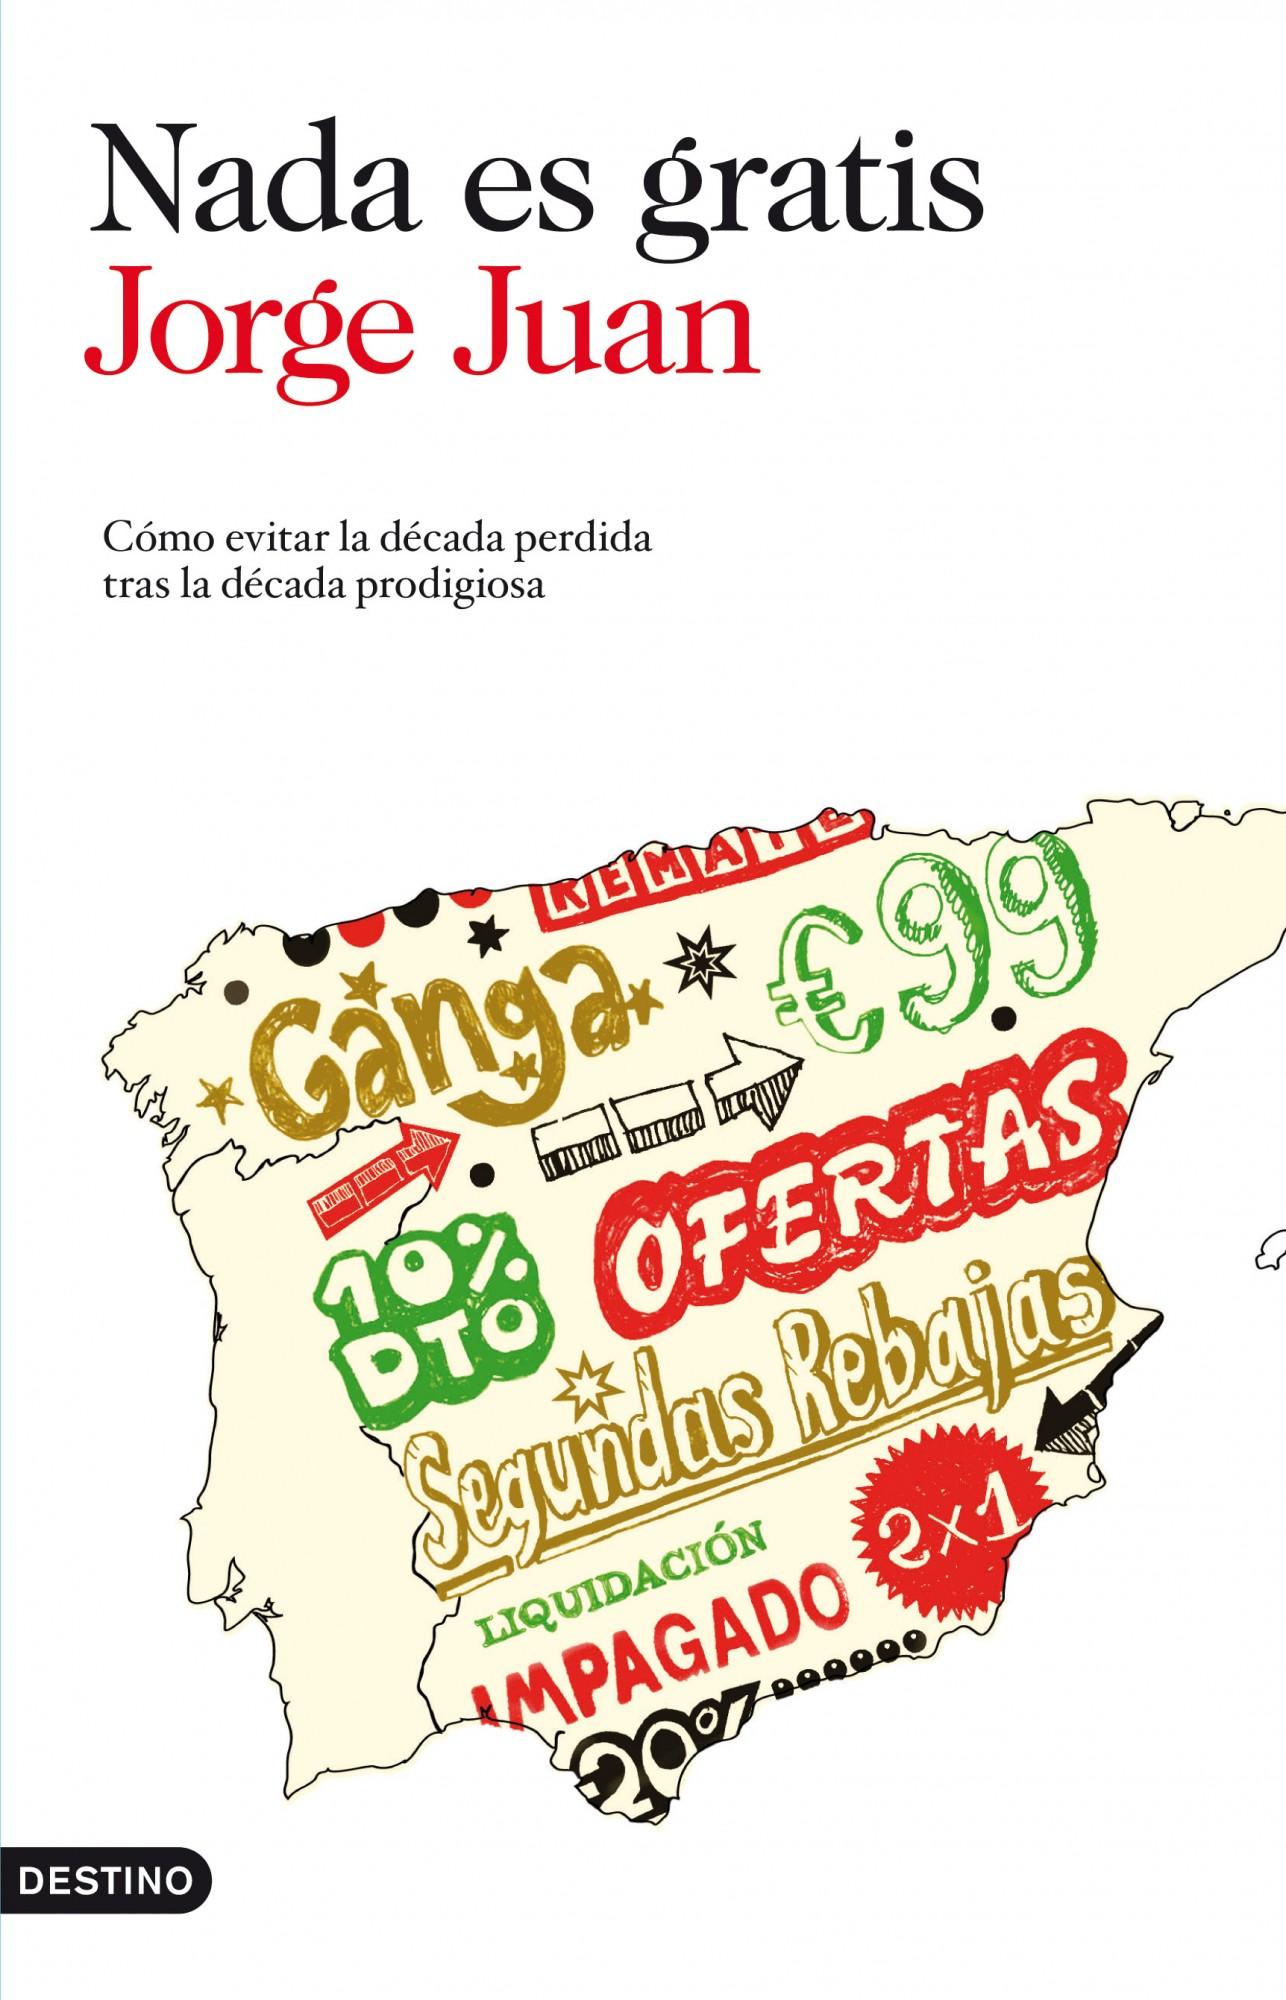 libro-ebook-nada-es-gratis-jorge-juan